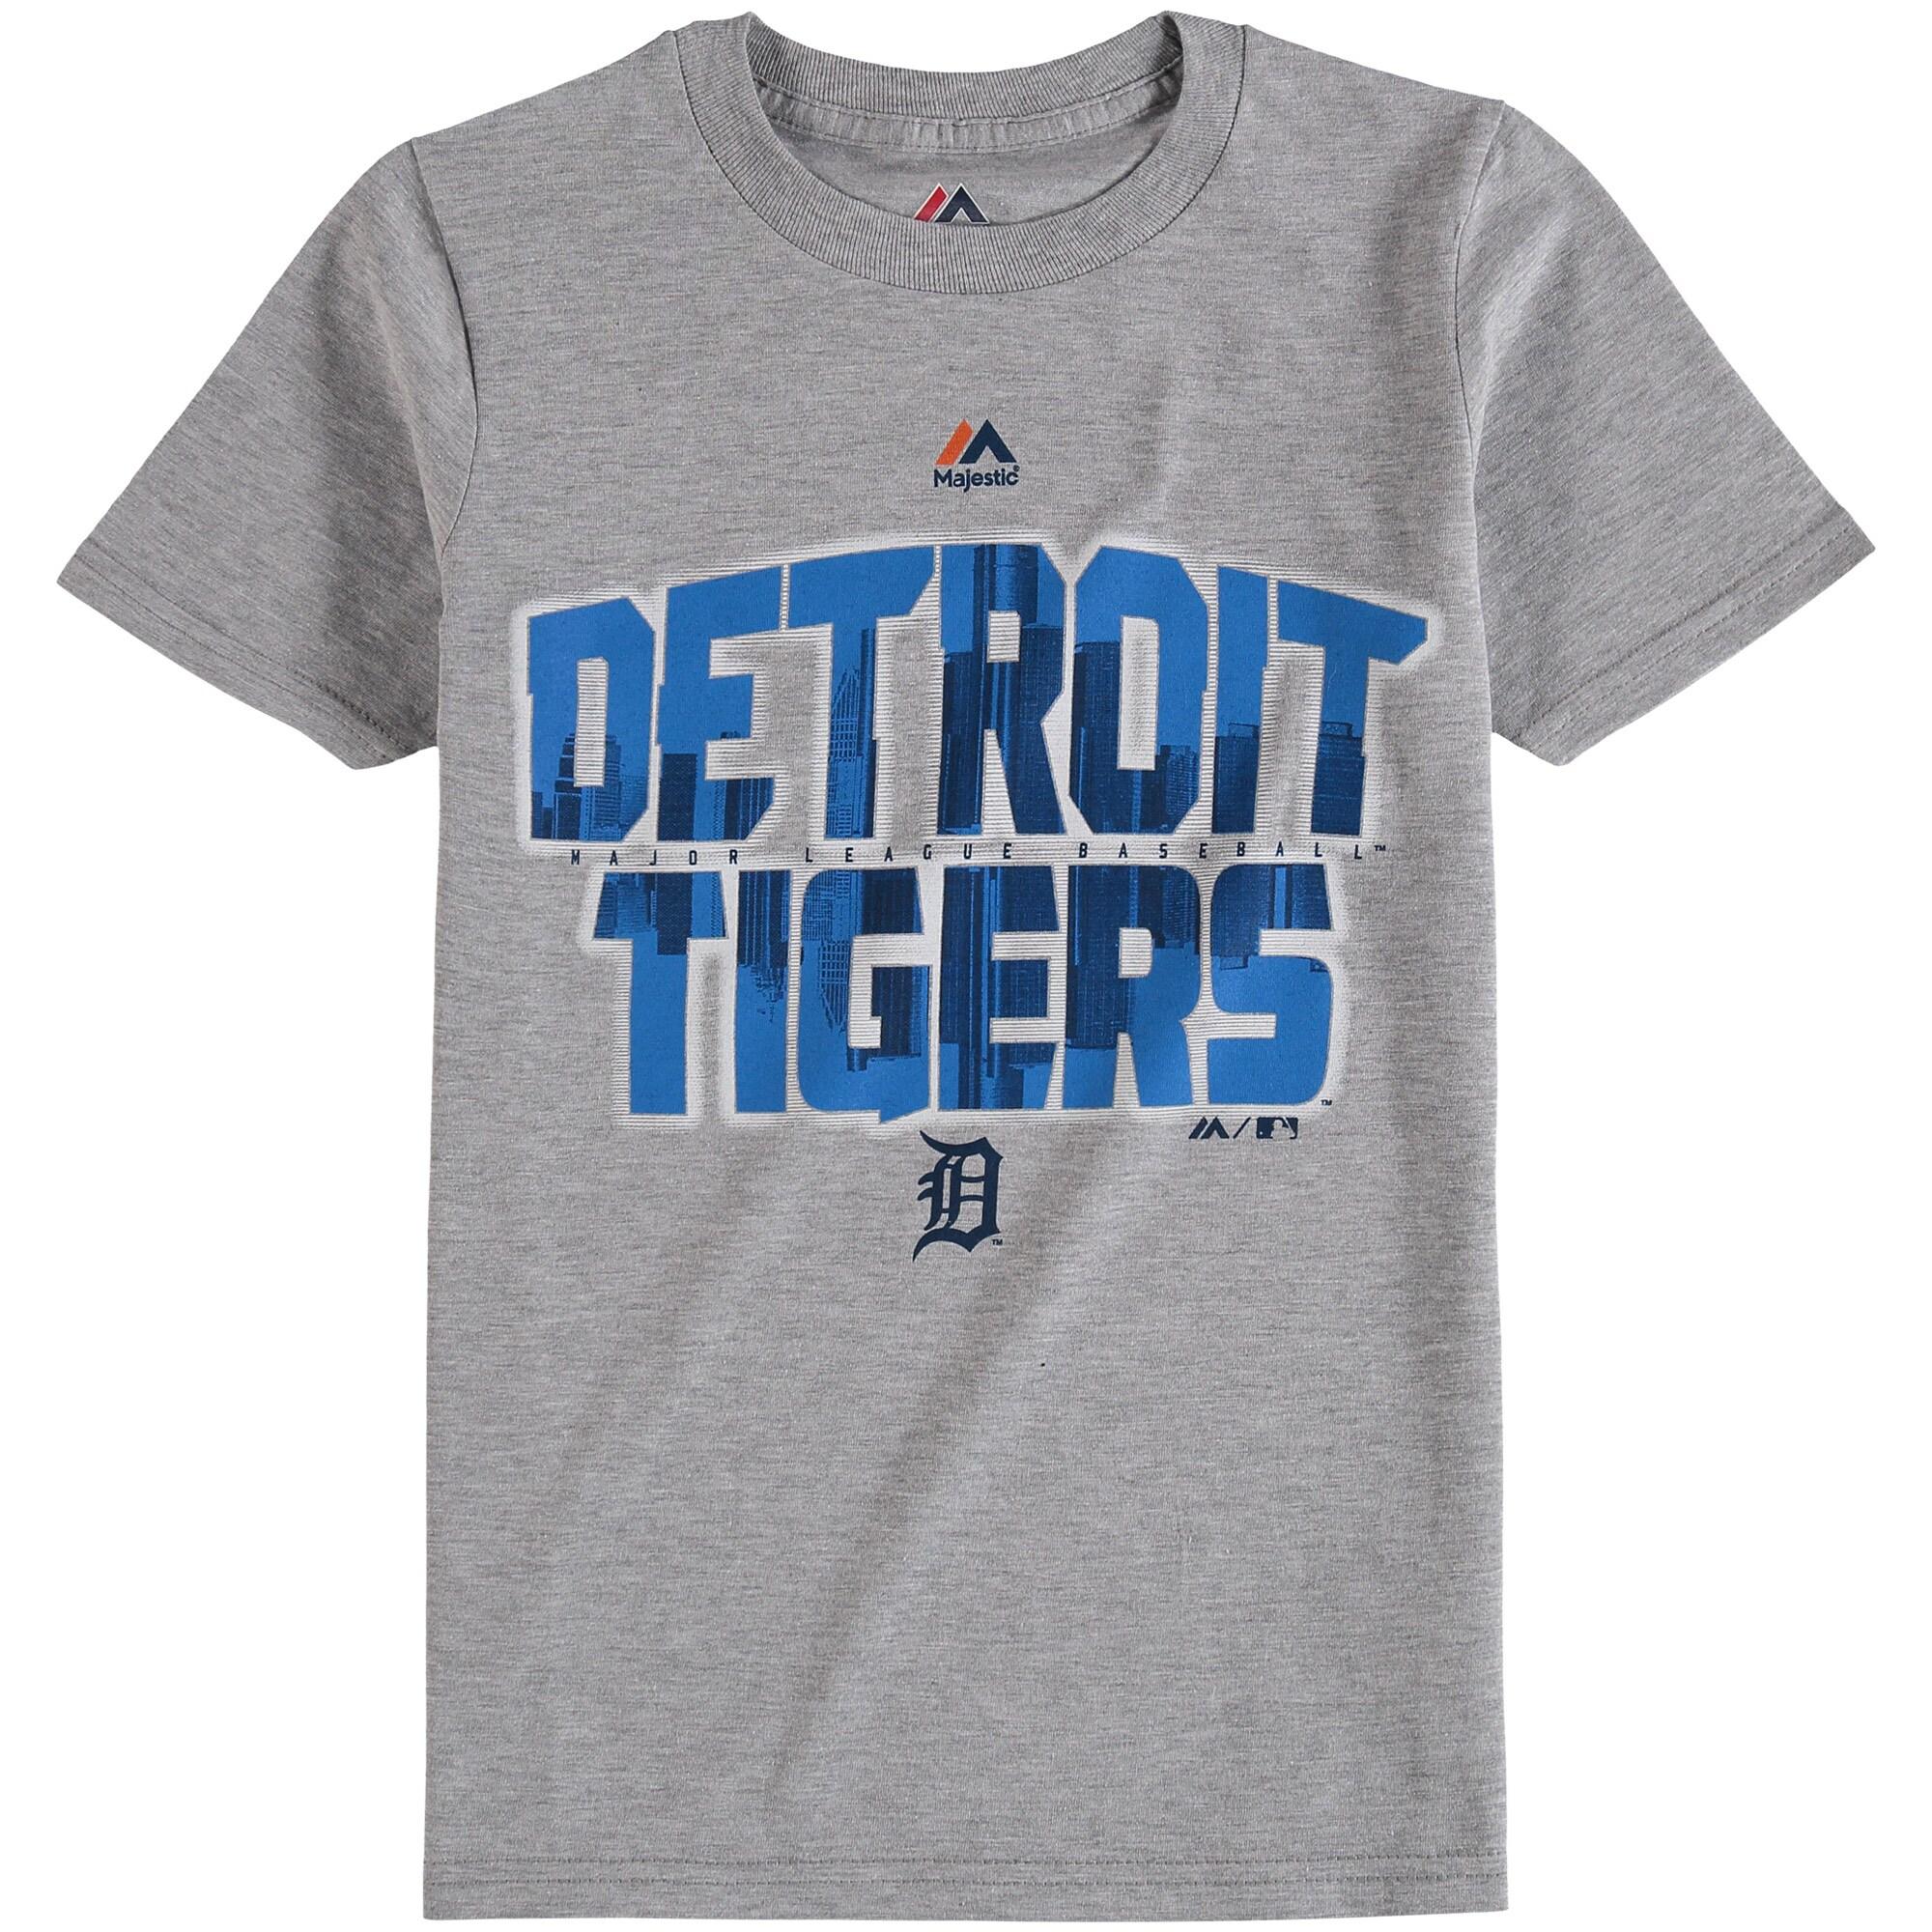 Detroit Tigers Majestic Youth Big City T-Shirt - Gray